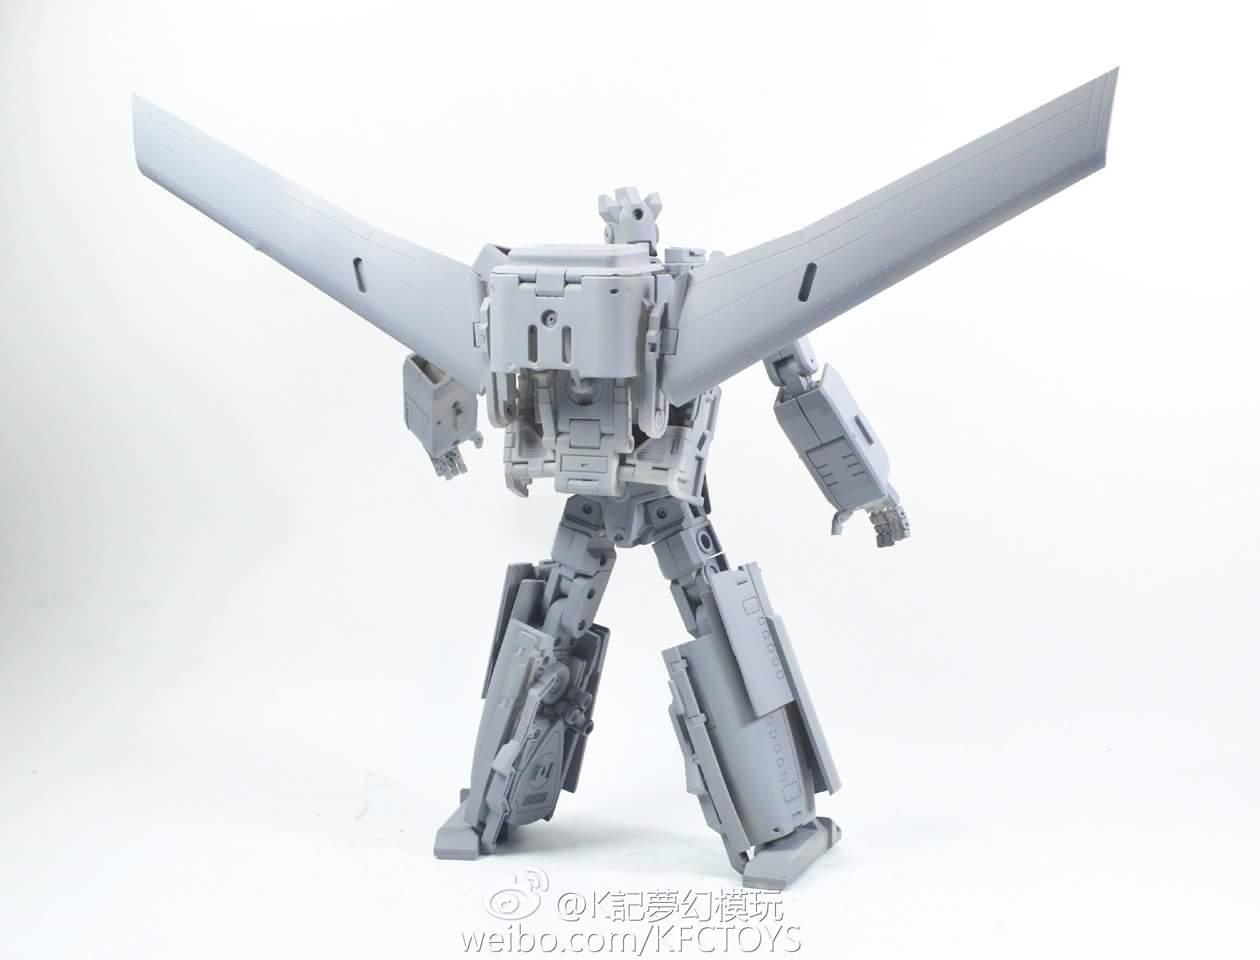 [KFC Toys] Produit Tiers - Jouet E.A.V.I Metal Phase 11A Stratotanker - aka Octane S7uImdhX